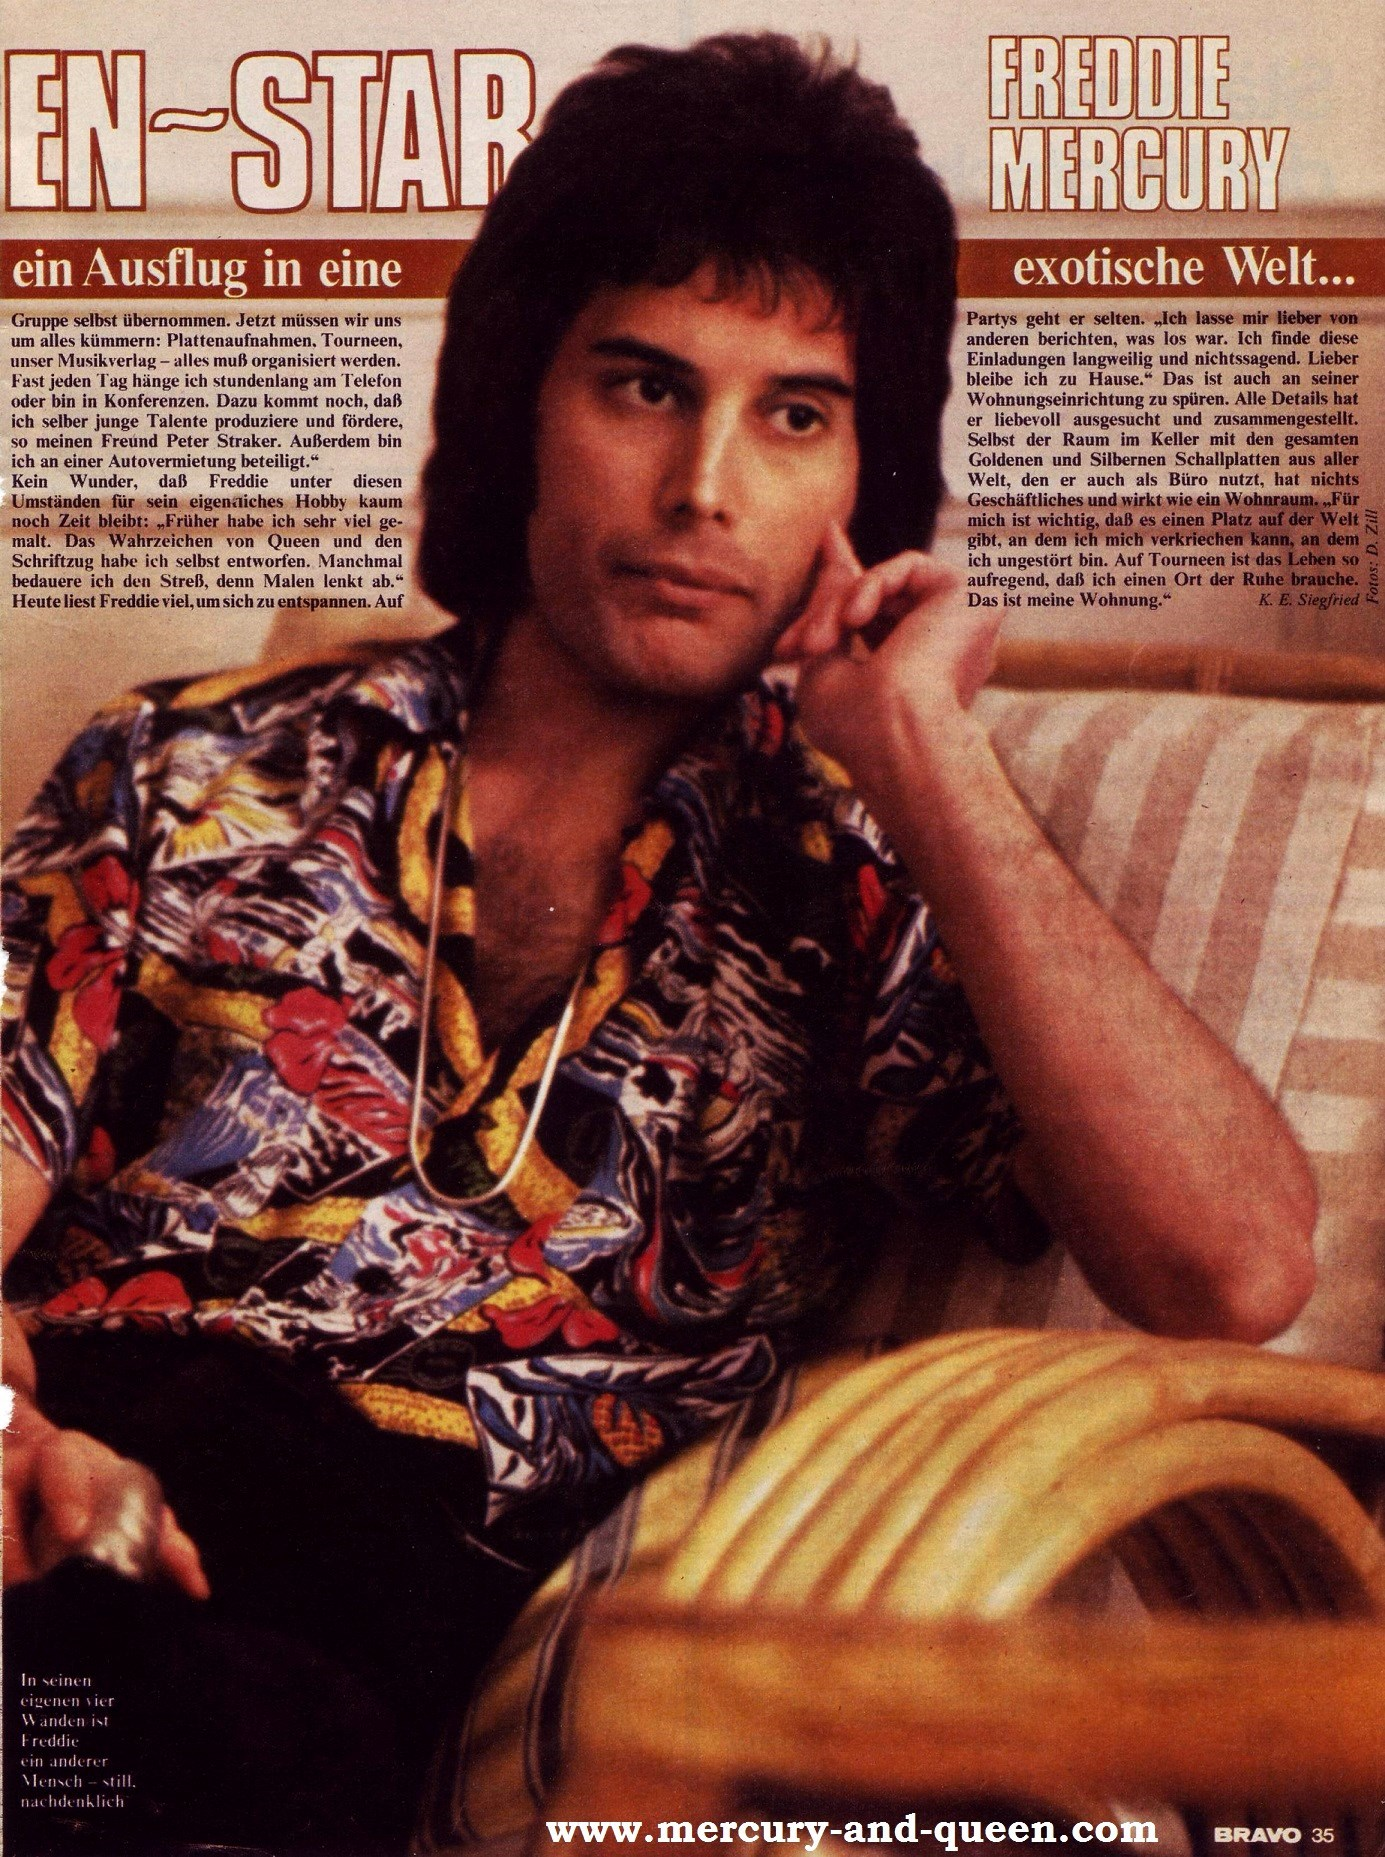 BRAVO magazine visits Freddie Mercury  1978  vintage